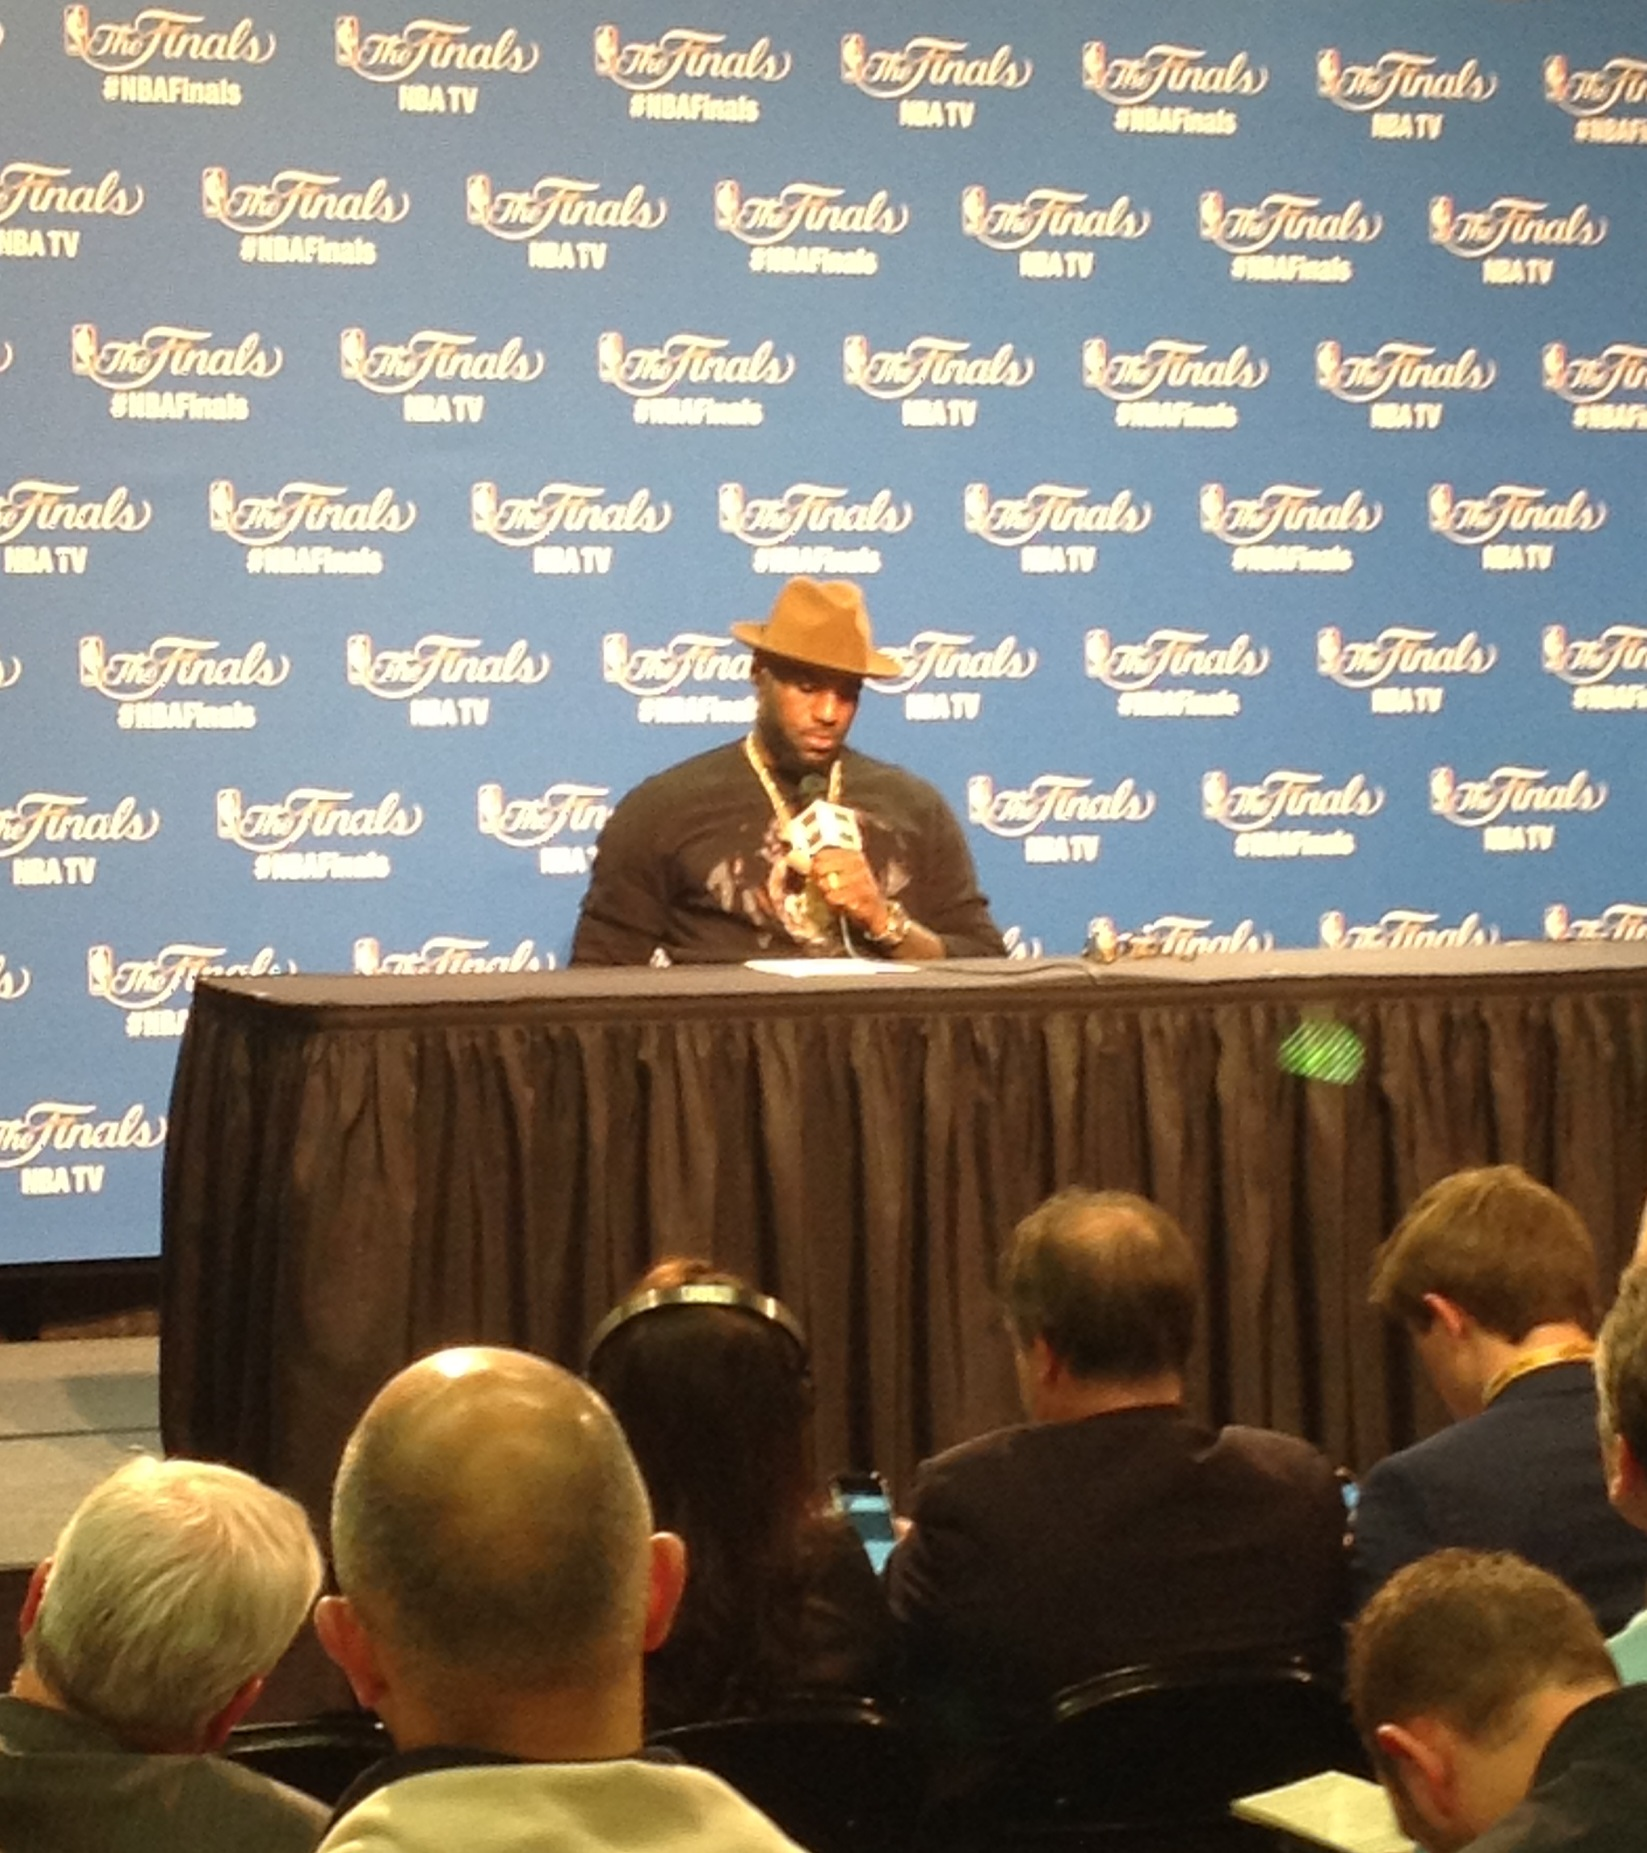 LeBron James Postgame Photo - Game 3 - NBA Finals